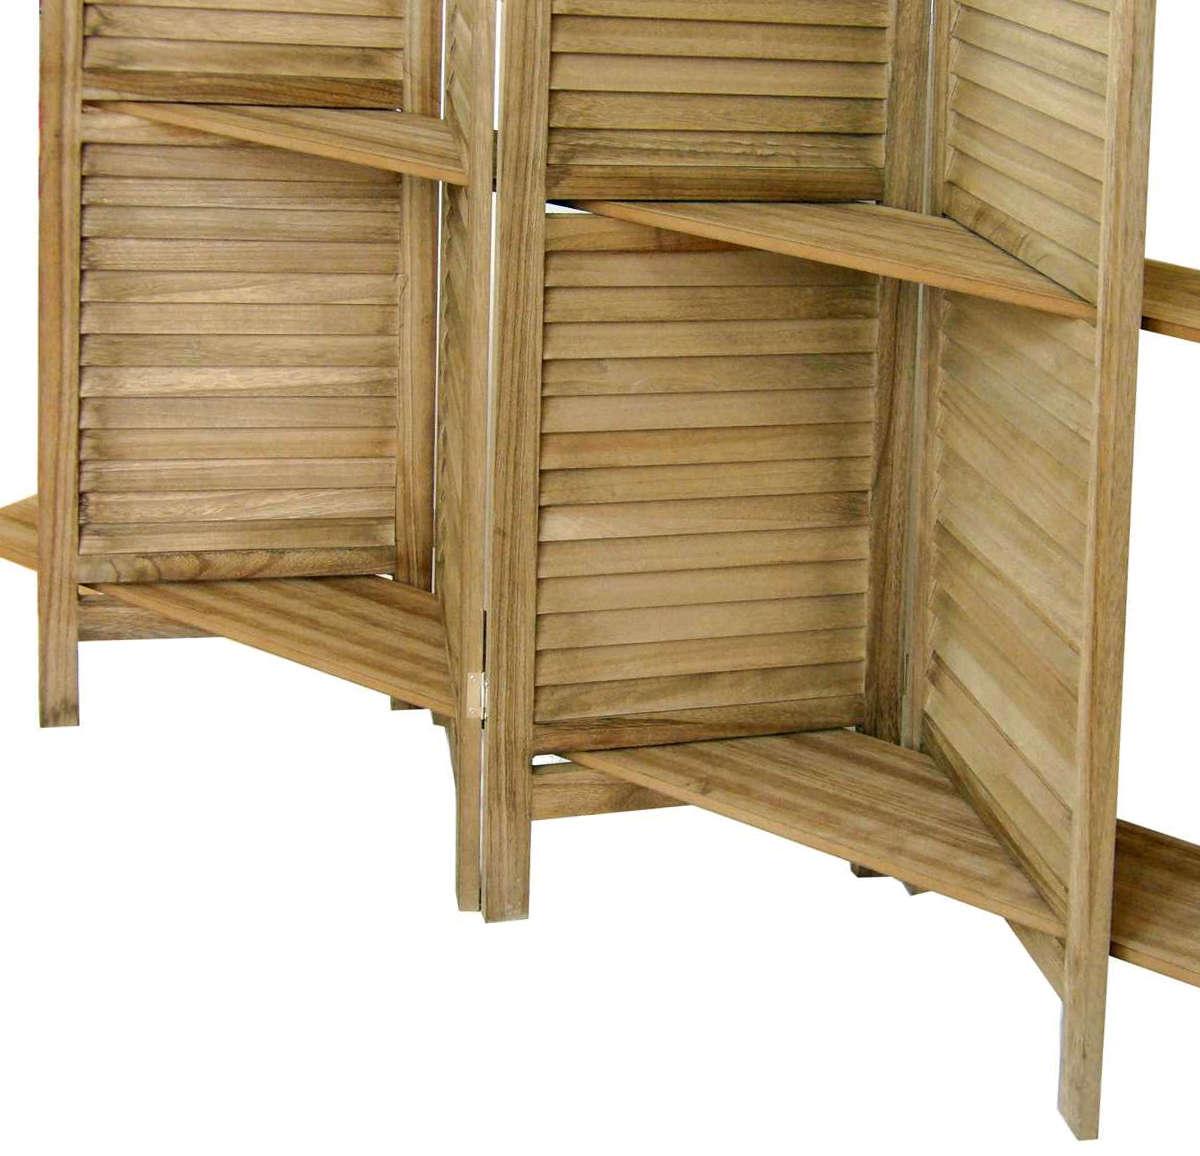 Biombo rústico con estantes